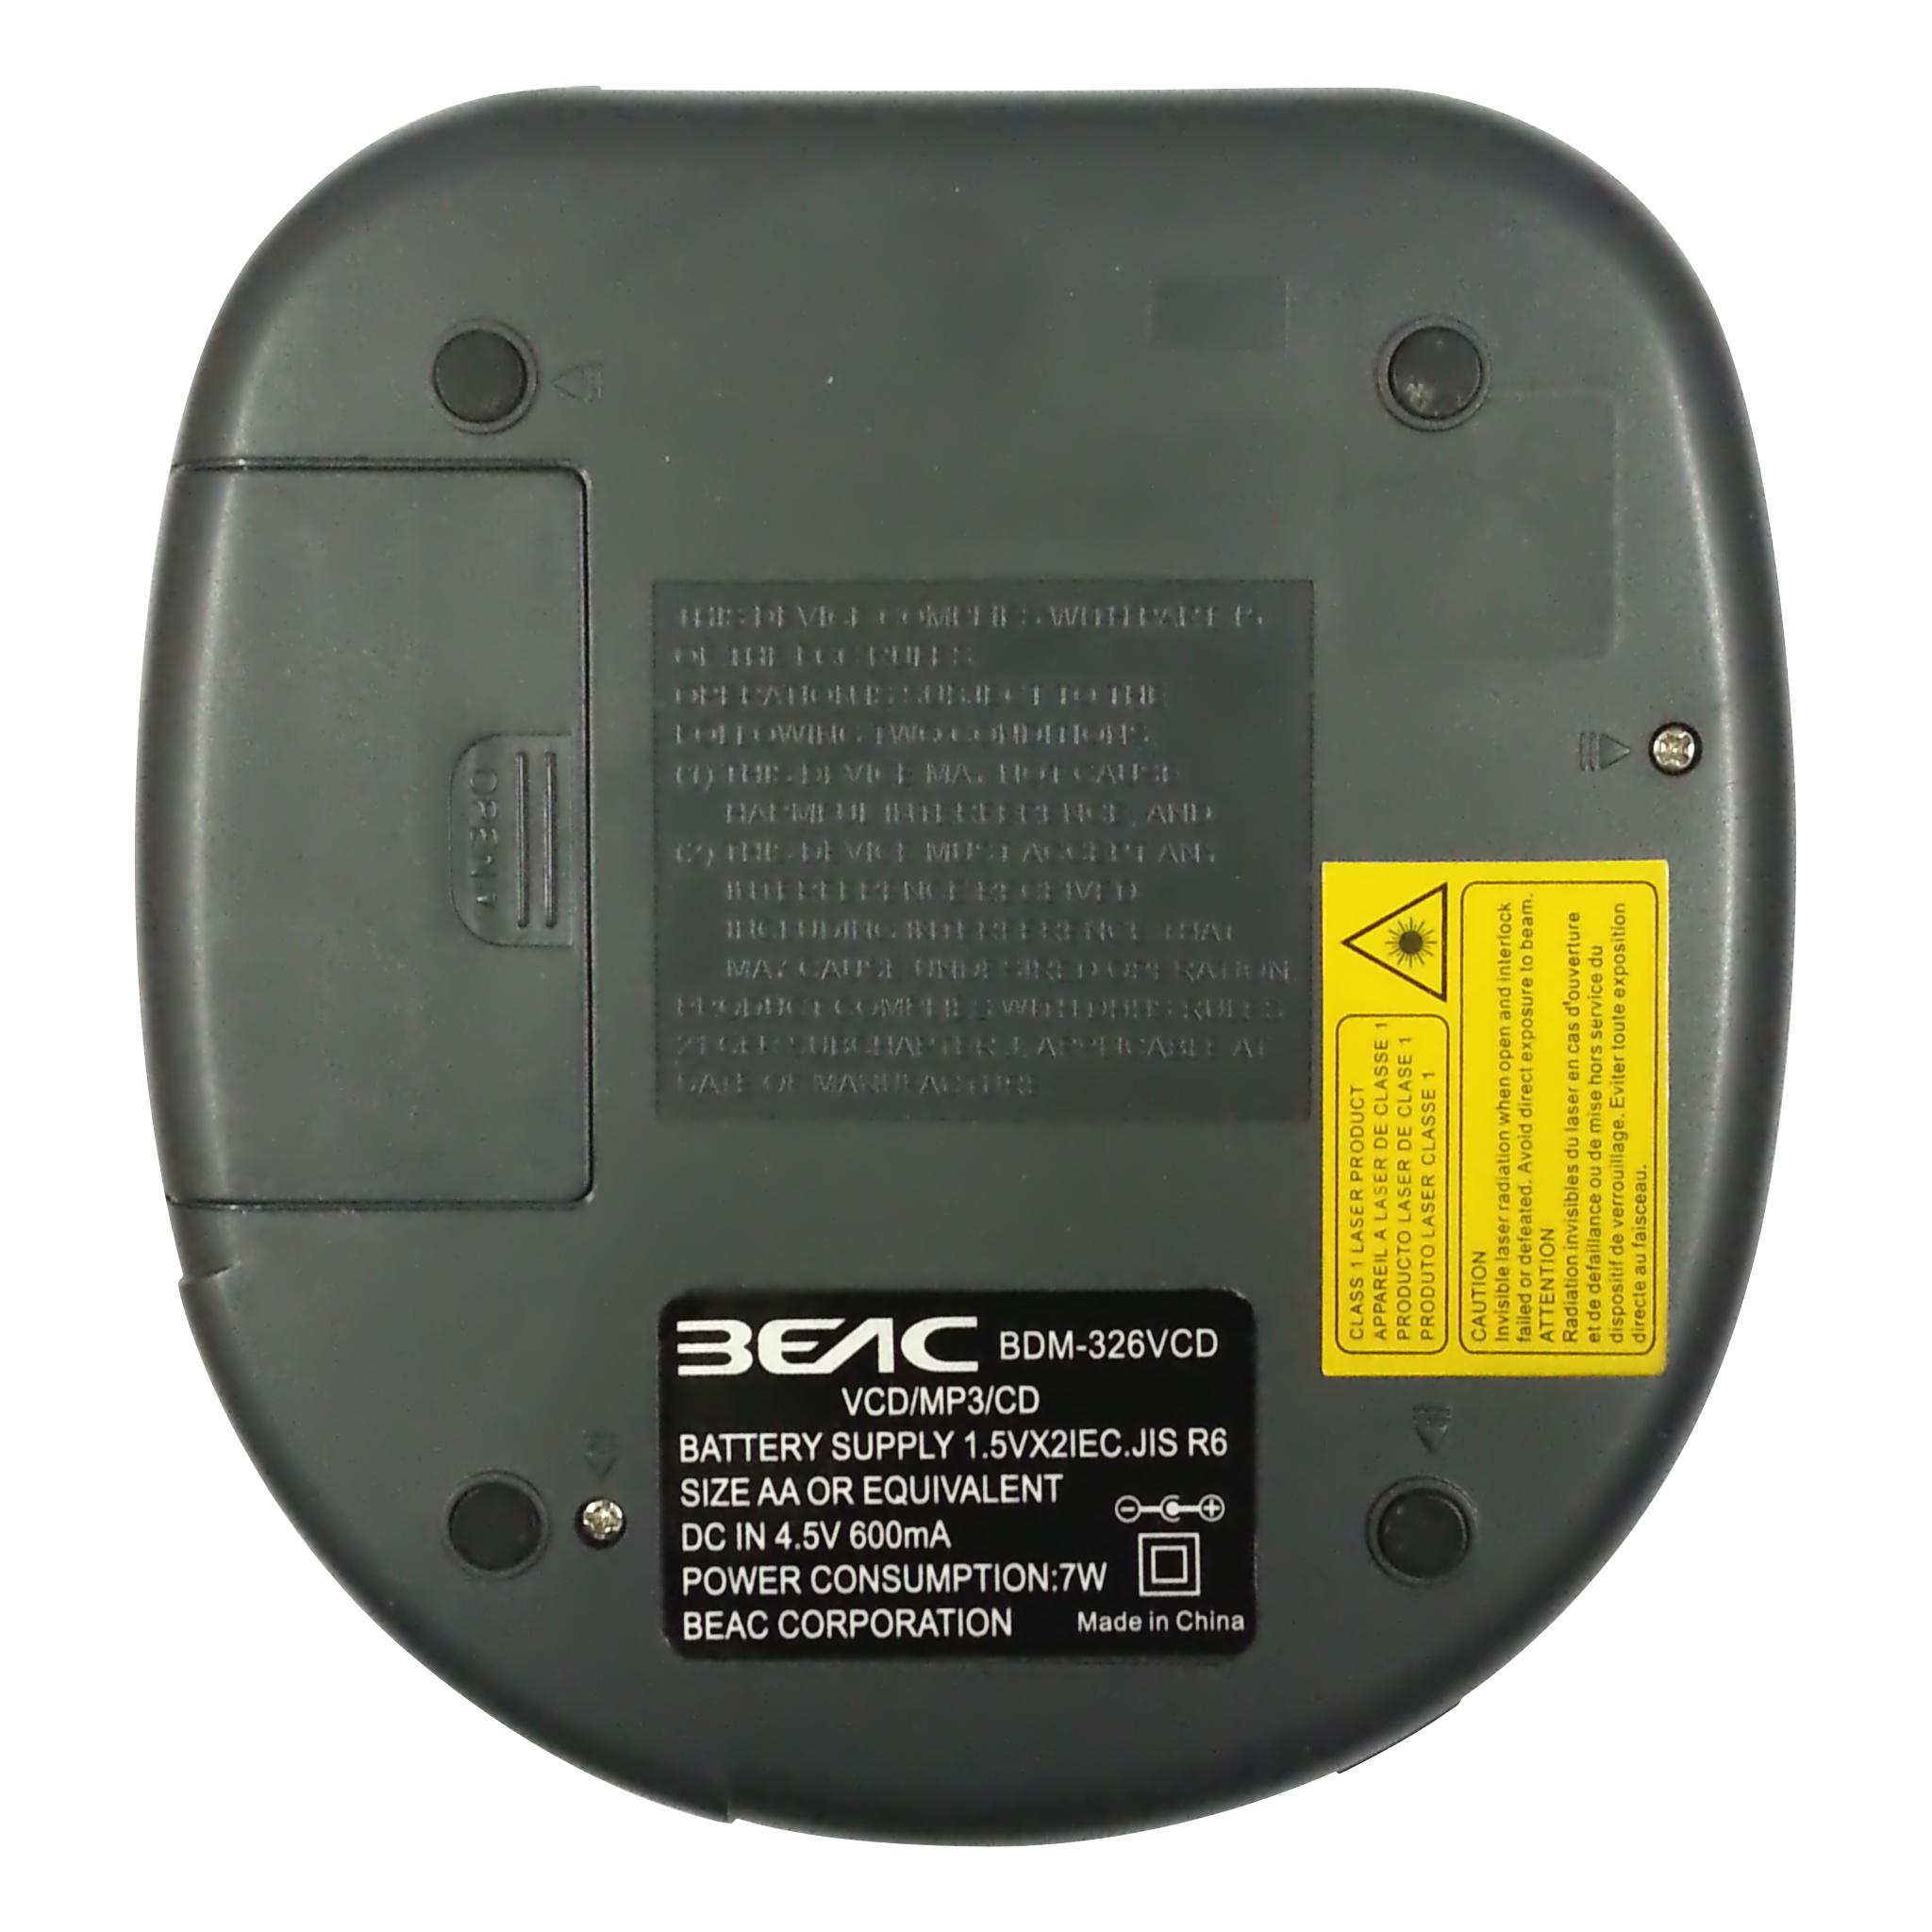 File:Beac BDM-326VCD (bottom view) jpg - Wikimedia Commons